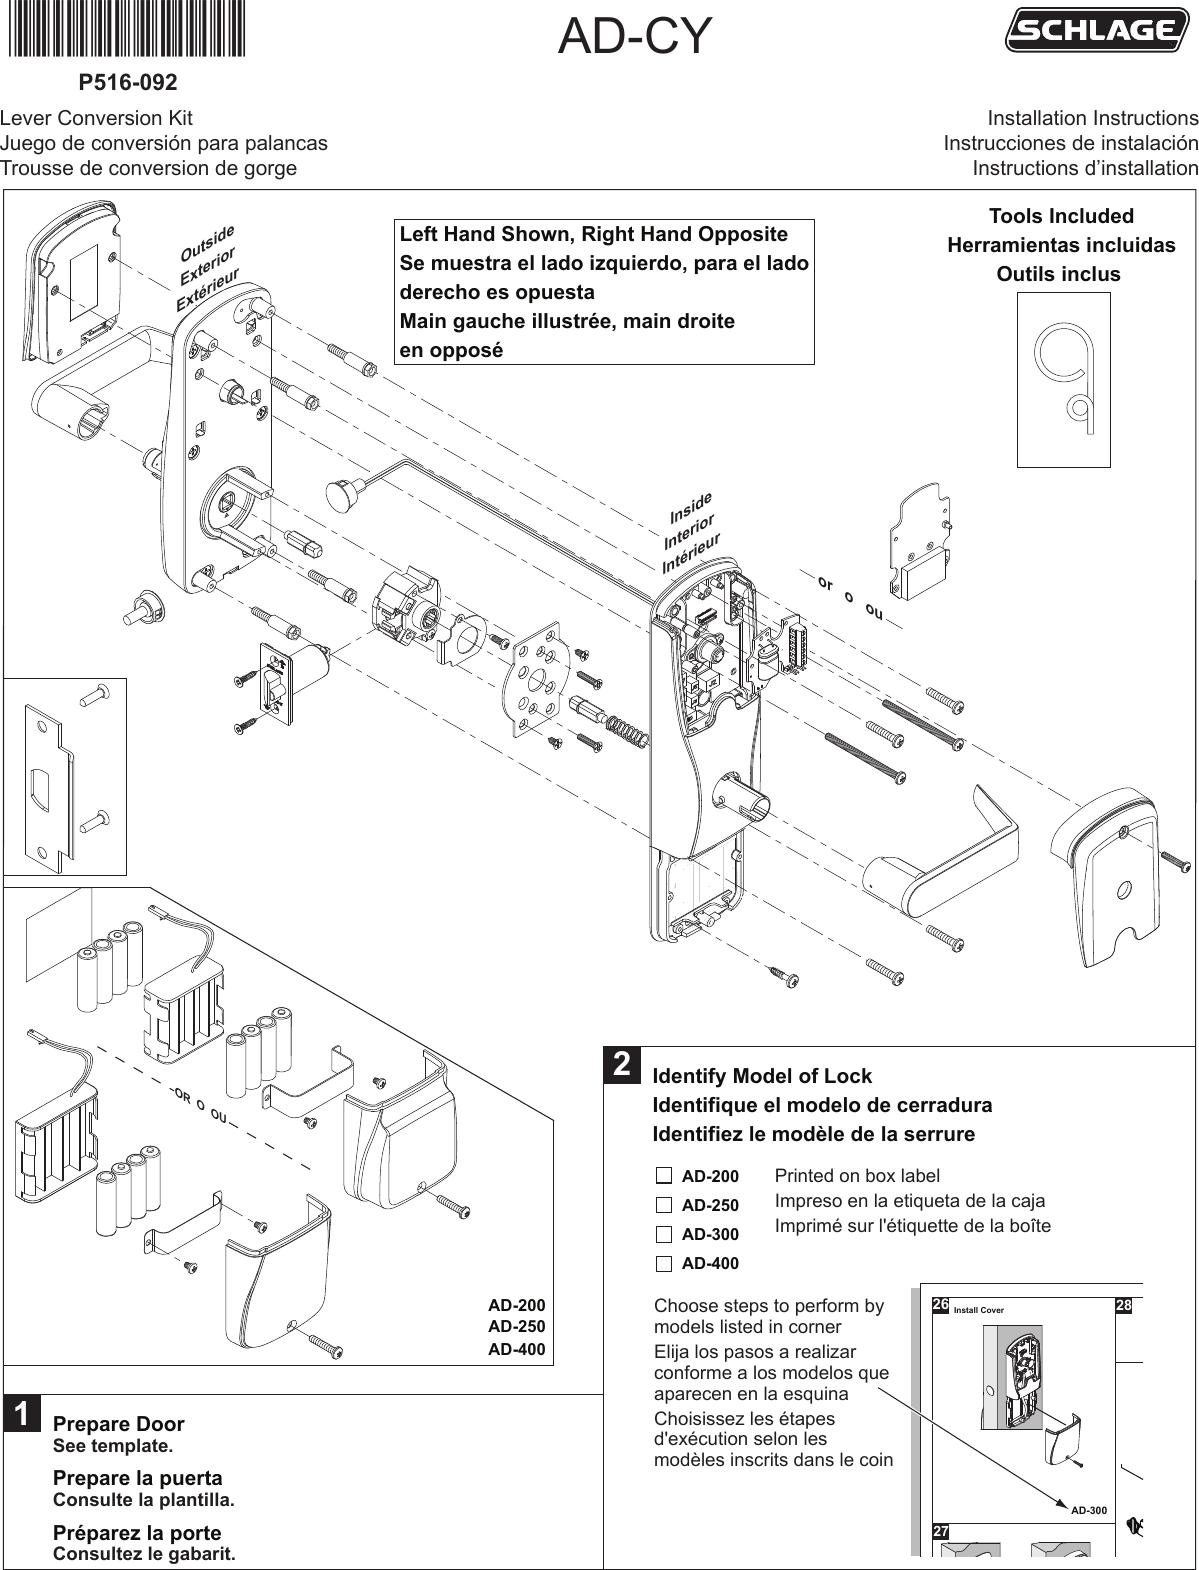 schlage electronics mechanical installation manuals ad series rh usermanual wiki Speaker Wiring Parallel vs Series Detroit Series 60 Wiring-Diagram